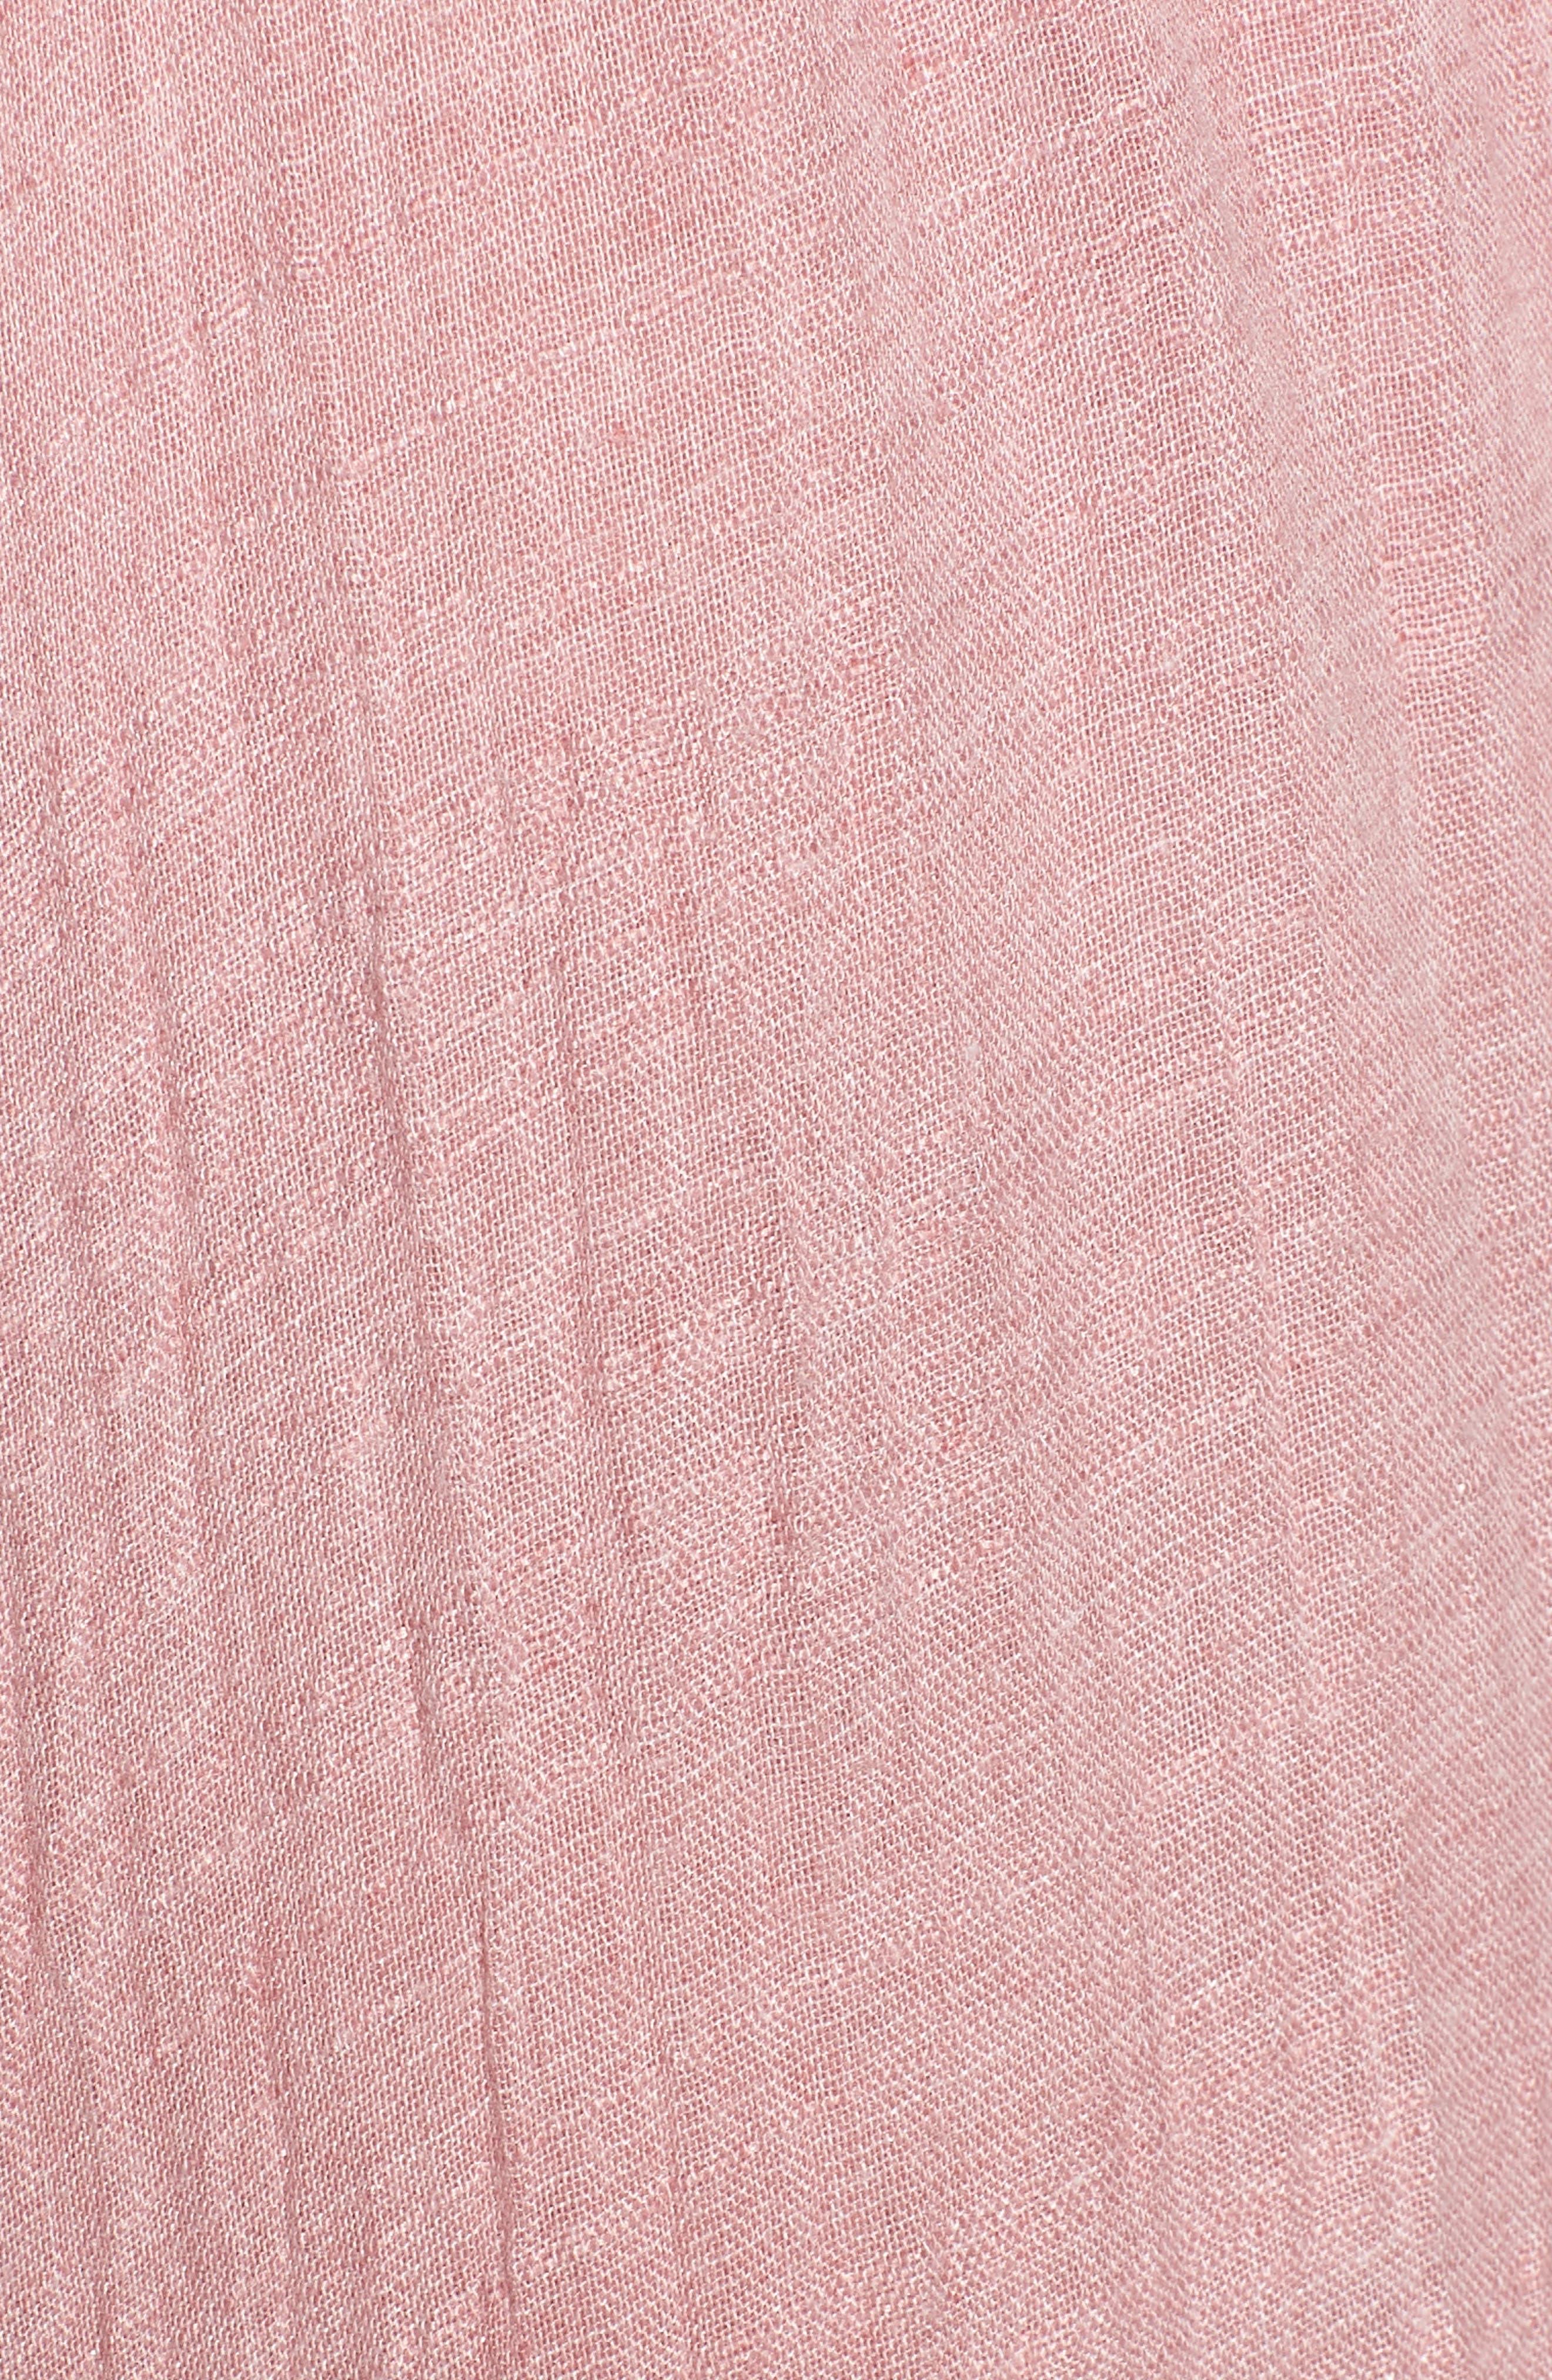 Nicolleta Tie Waist Midi Dress,                             Alternate thumbnail 5, color,                             650